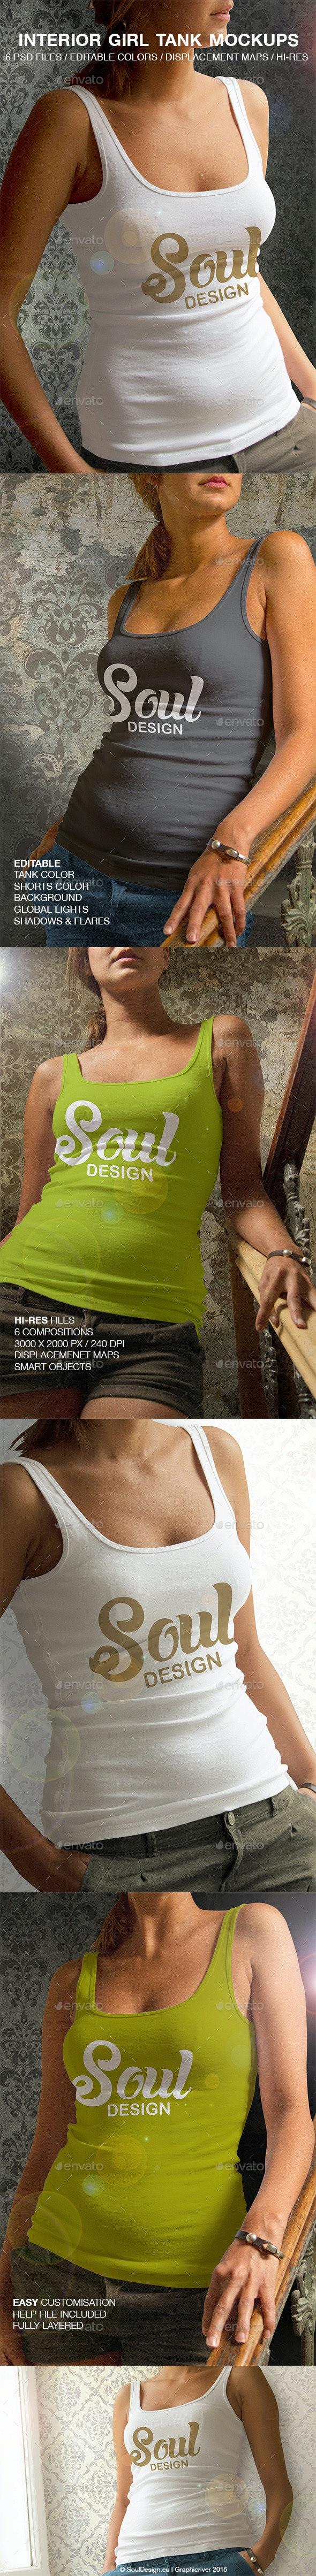 6 Interior Girl Tank Mockups - Apparel Product Mock-Ups